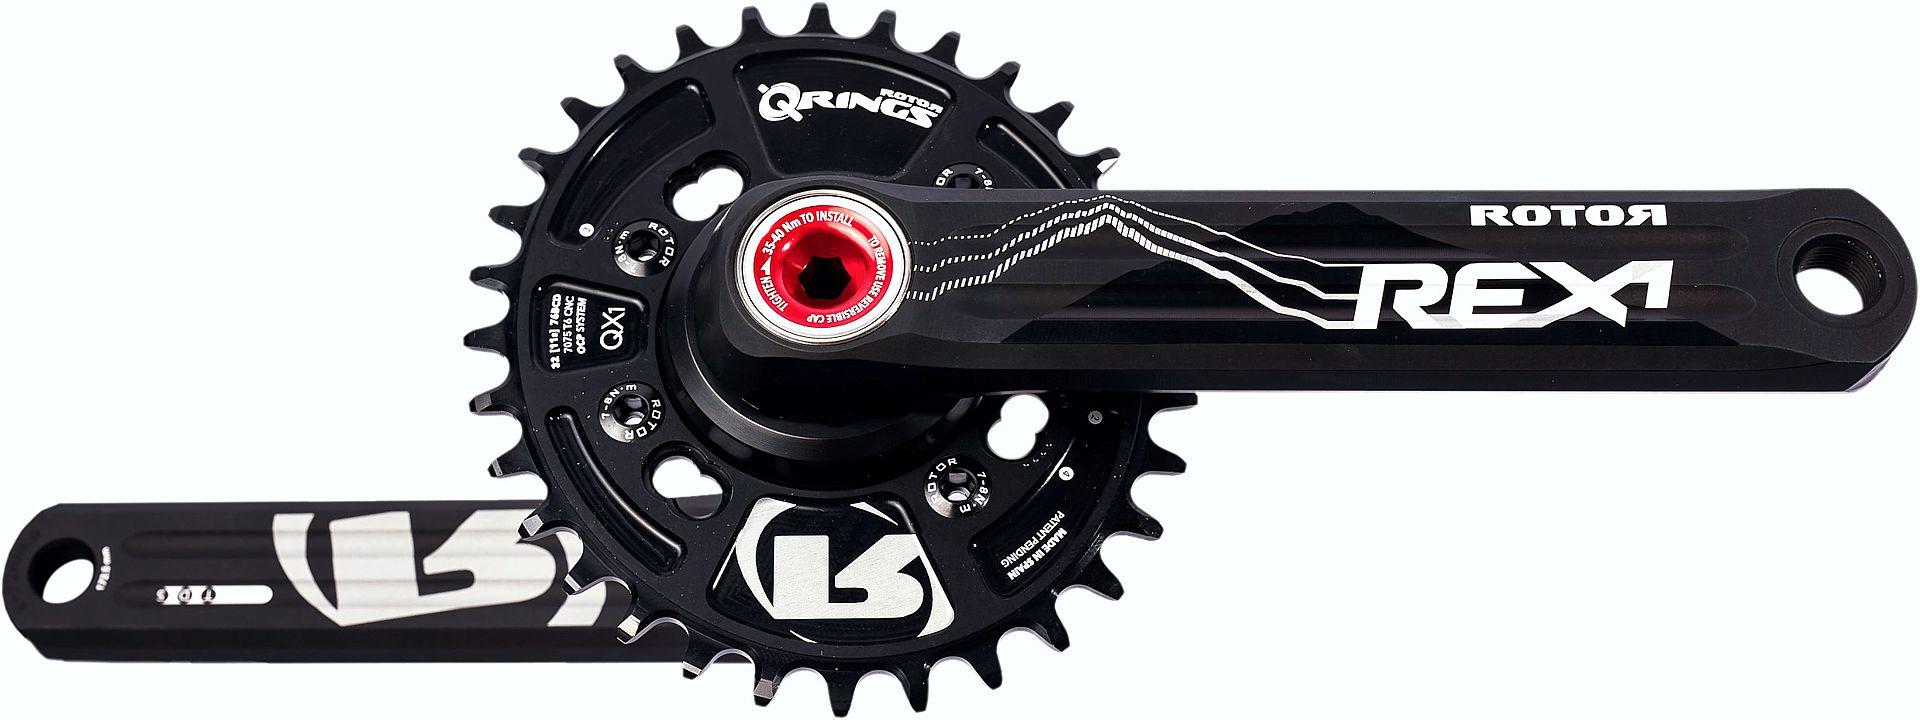 ROTOR INpower Rex 1.1 Powermeter